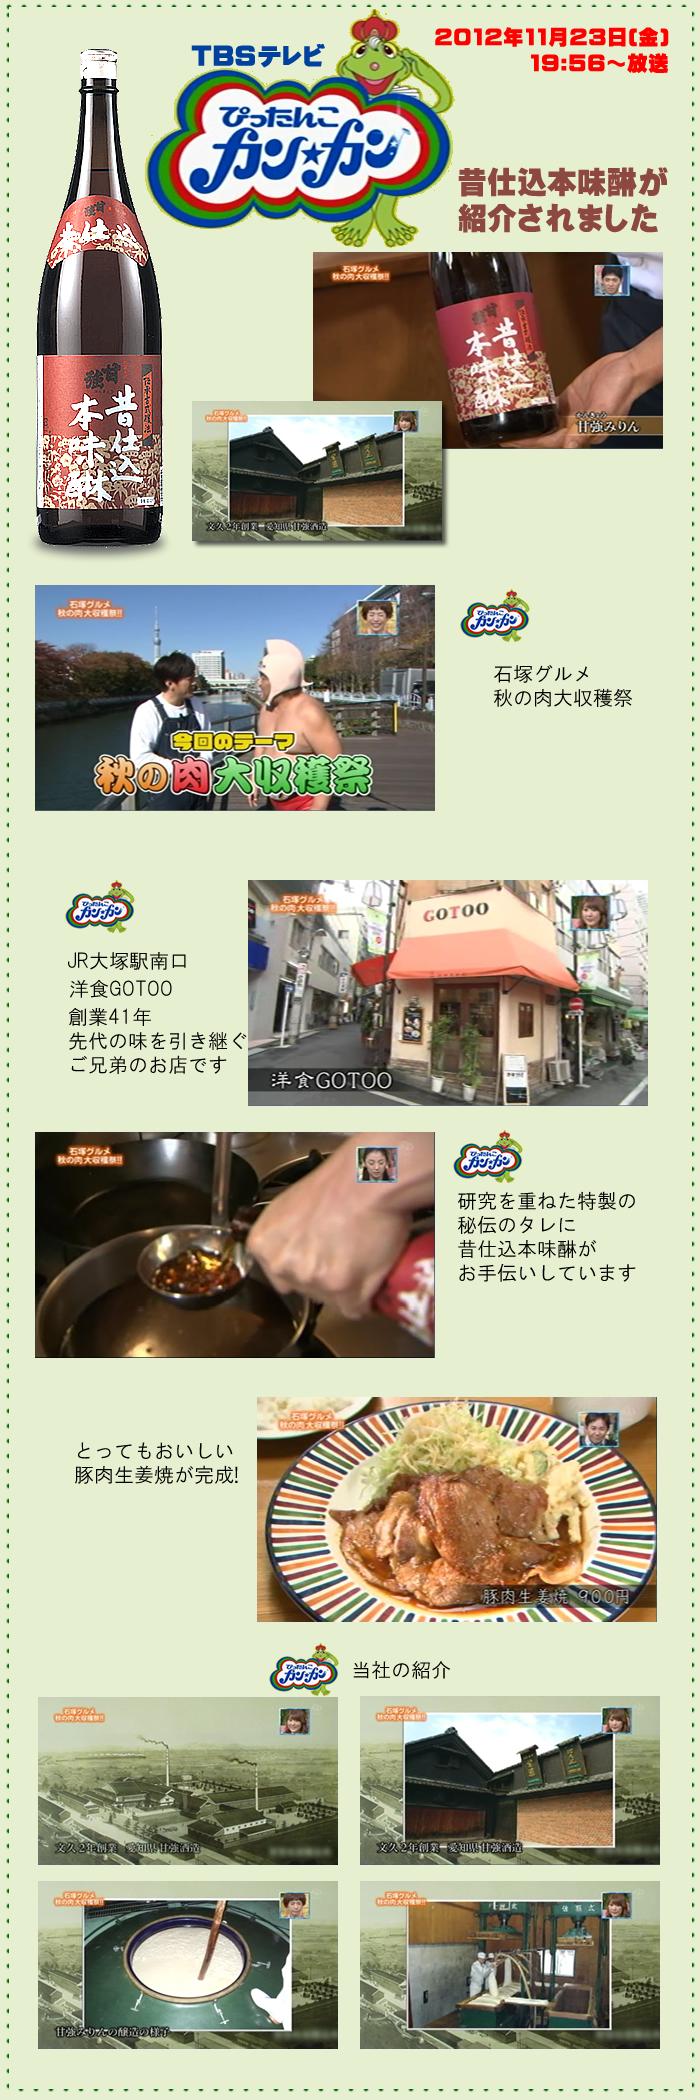 TBSテレビ系列「ぴったんこカン・カン」